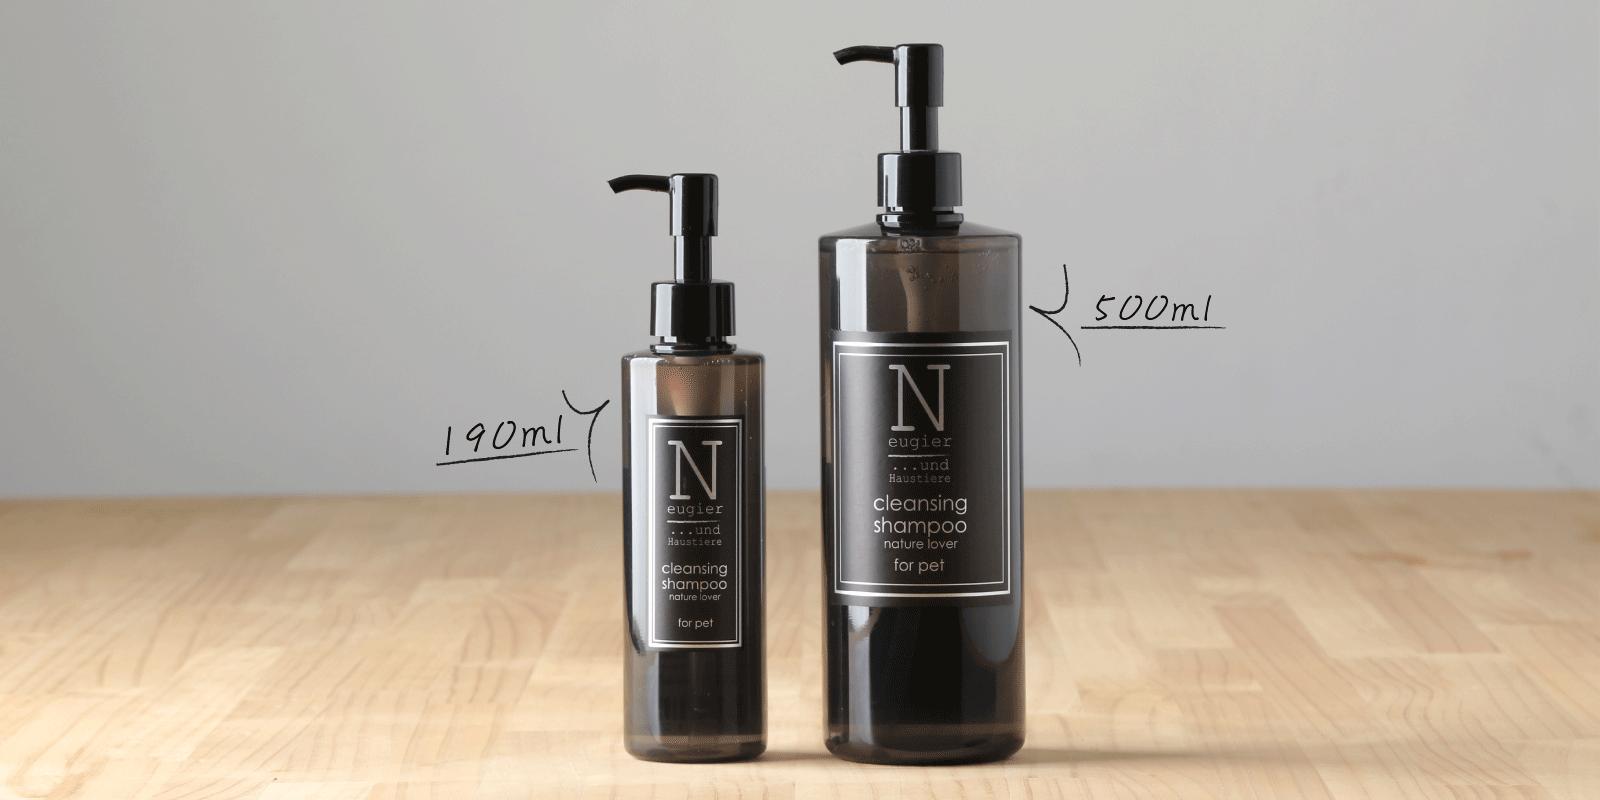 Neugier-cleansing-shampoo